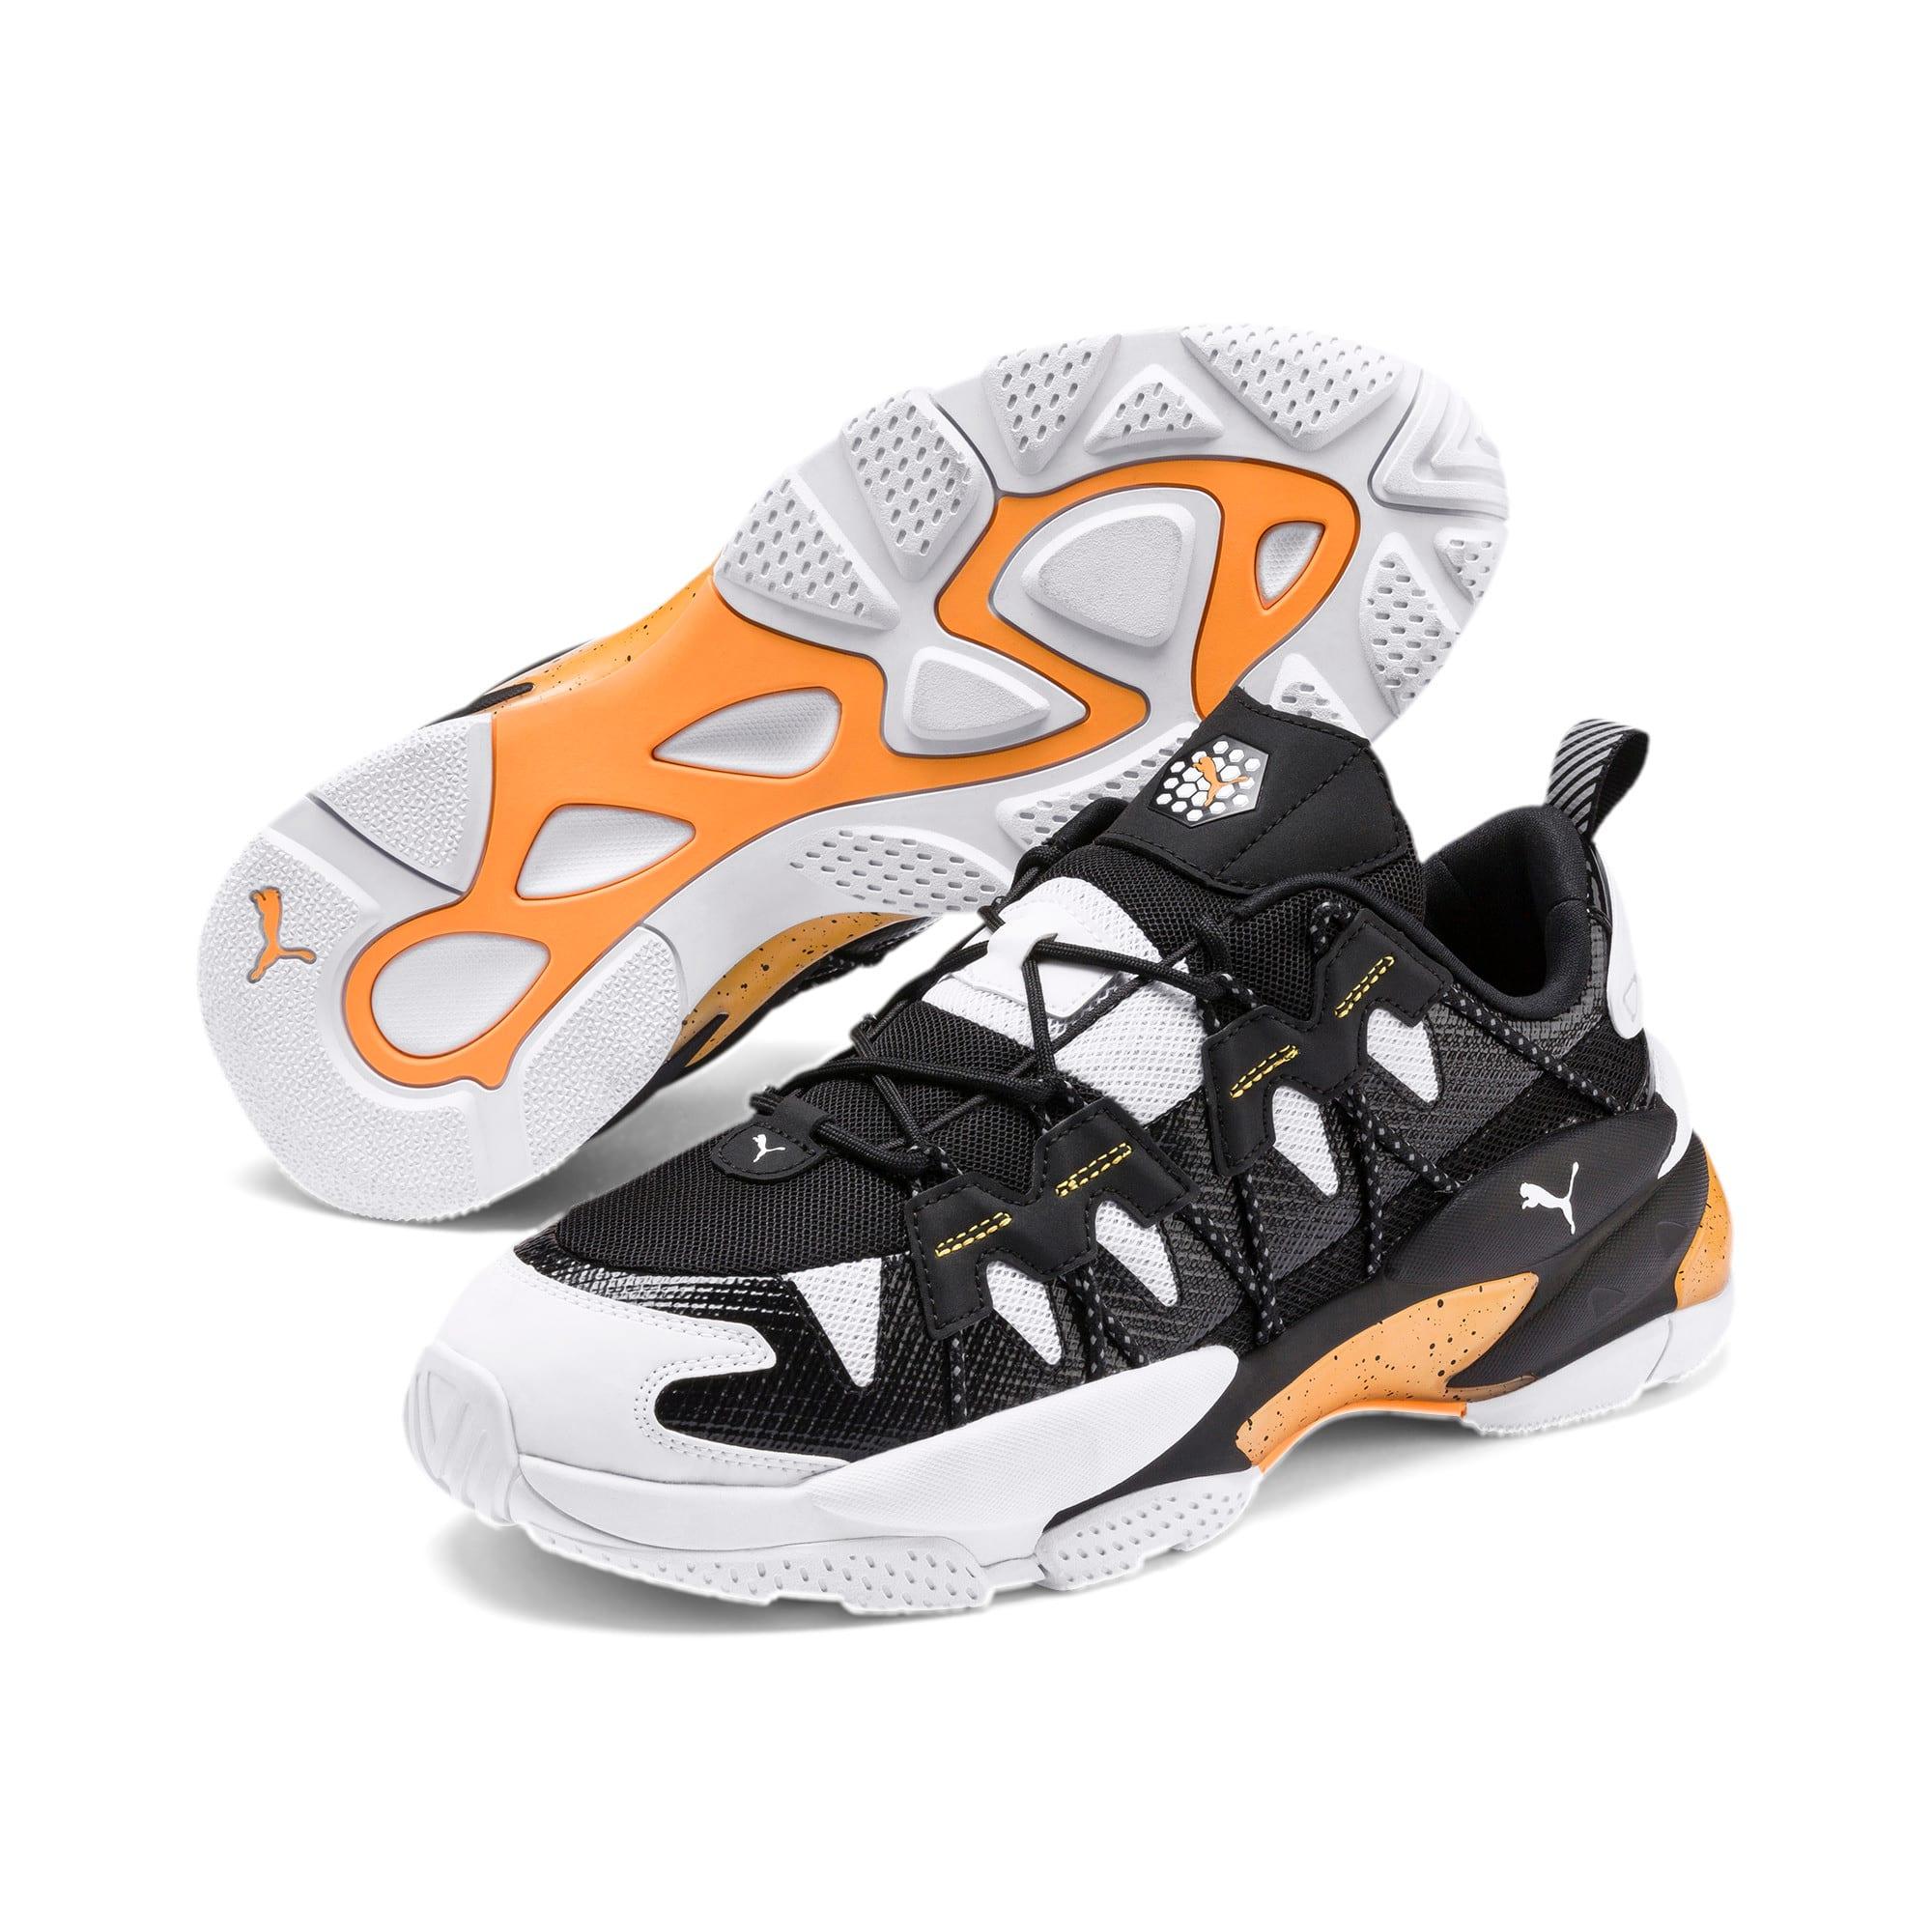 Thumbnail 2 of LQDCELL Omega Density Sneakers, Puma White-Puma Black, medium